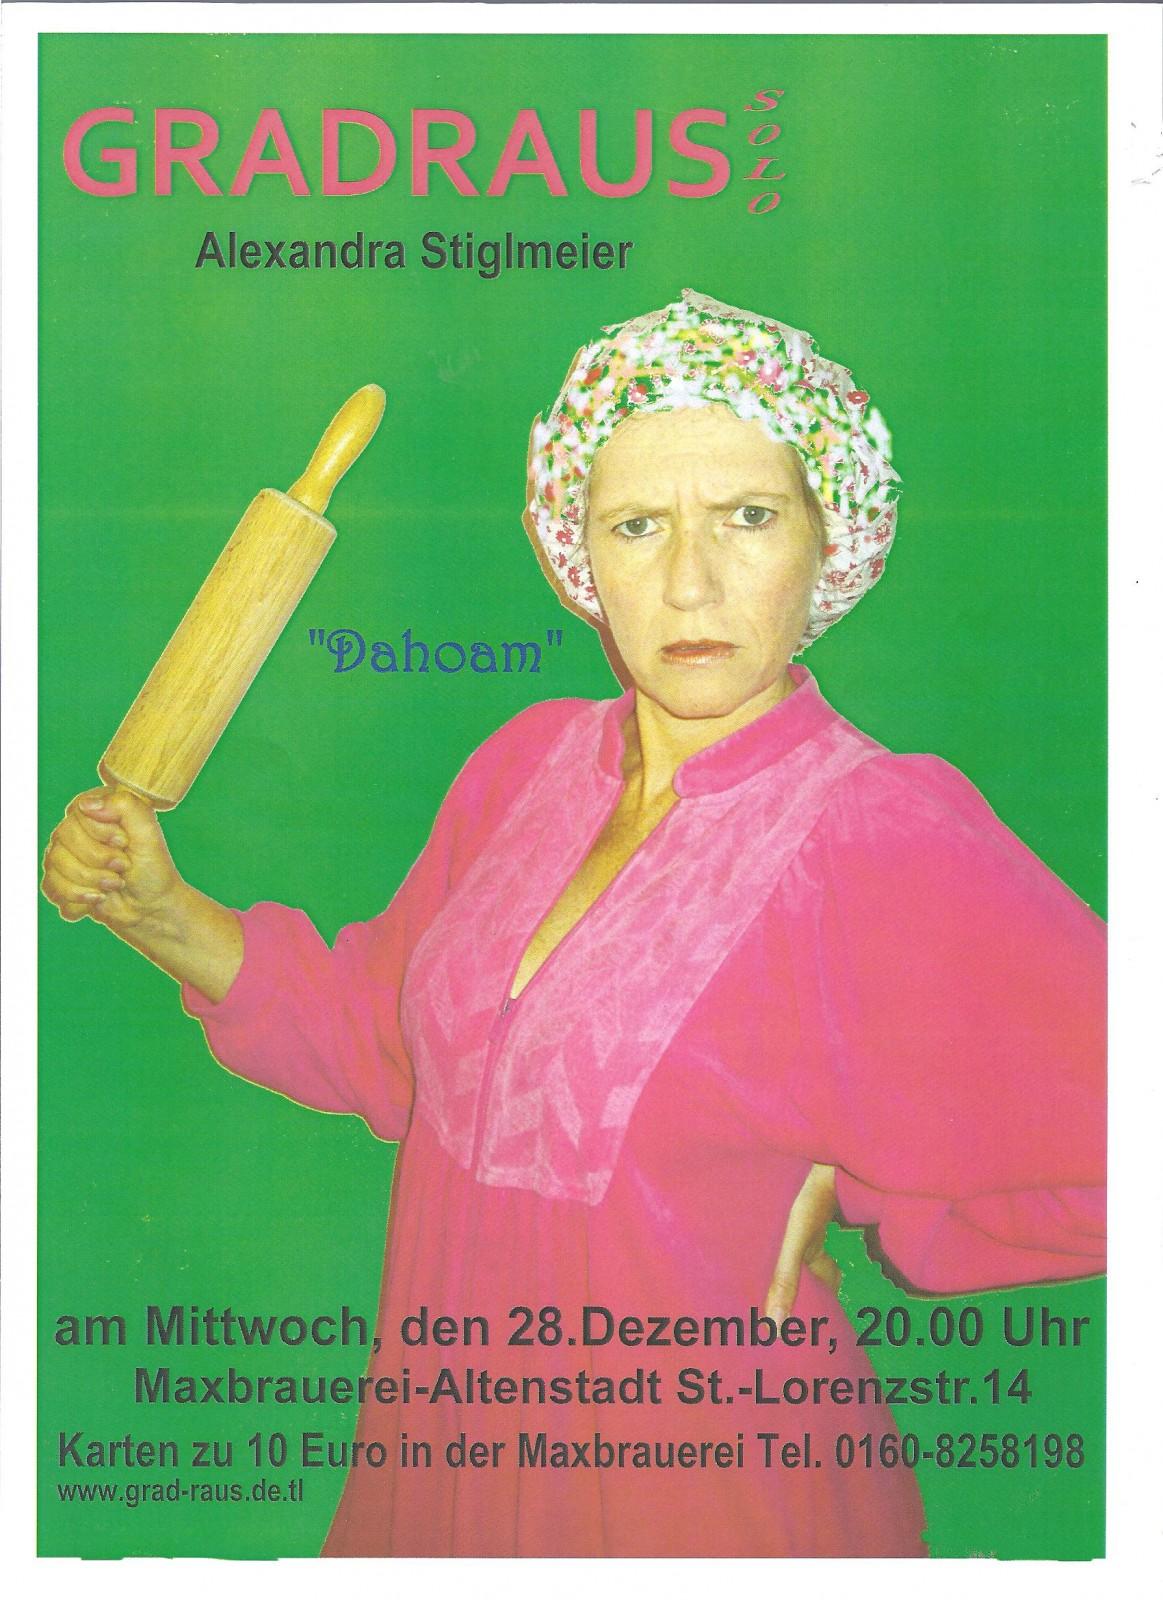 alexandra-stieglmeier